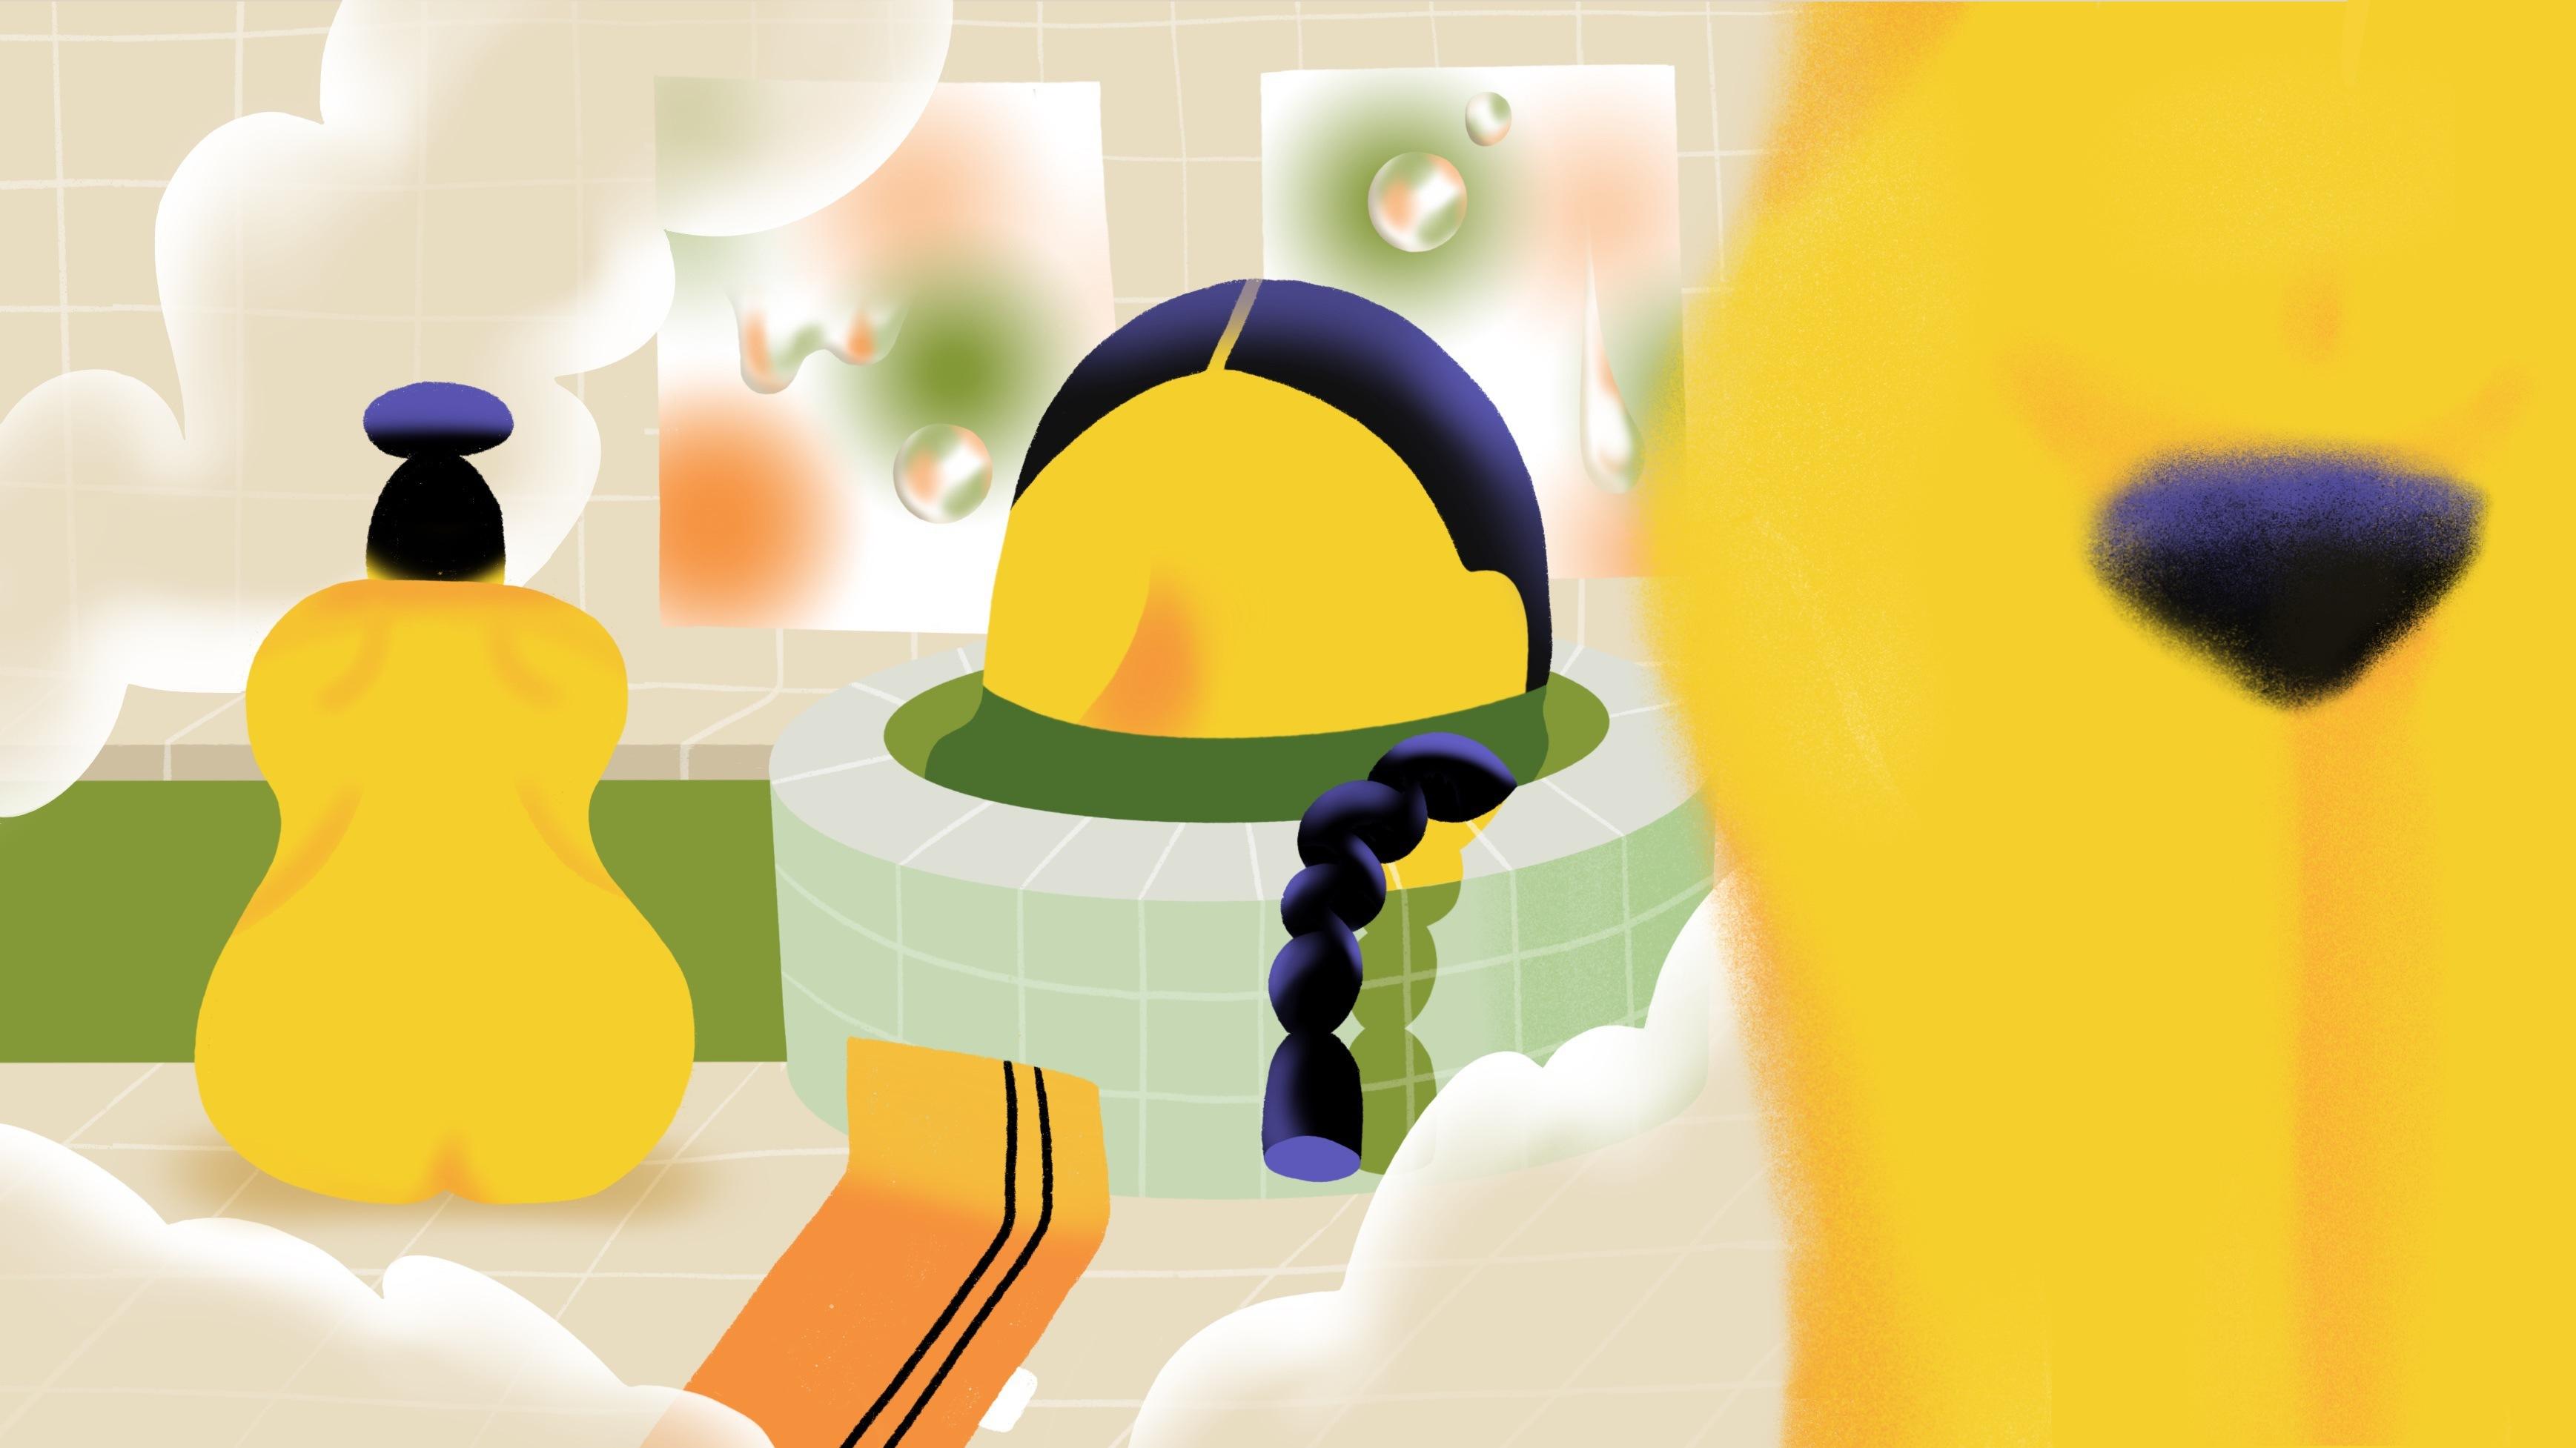 Illustration by Christine Cha